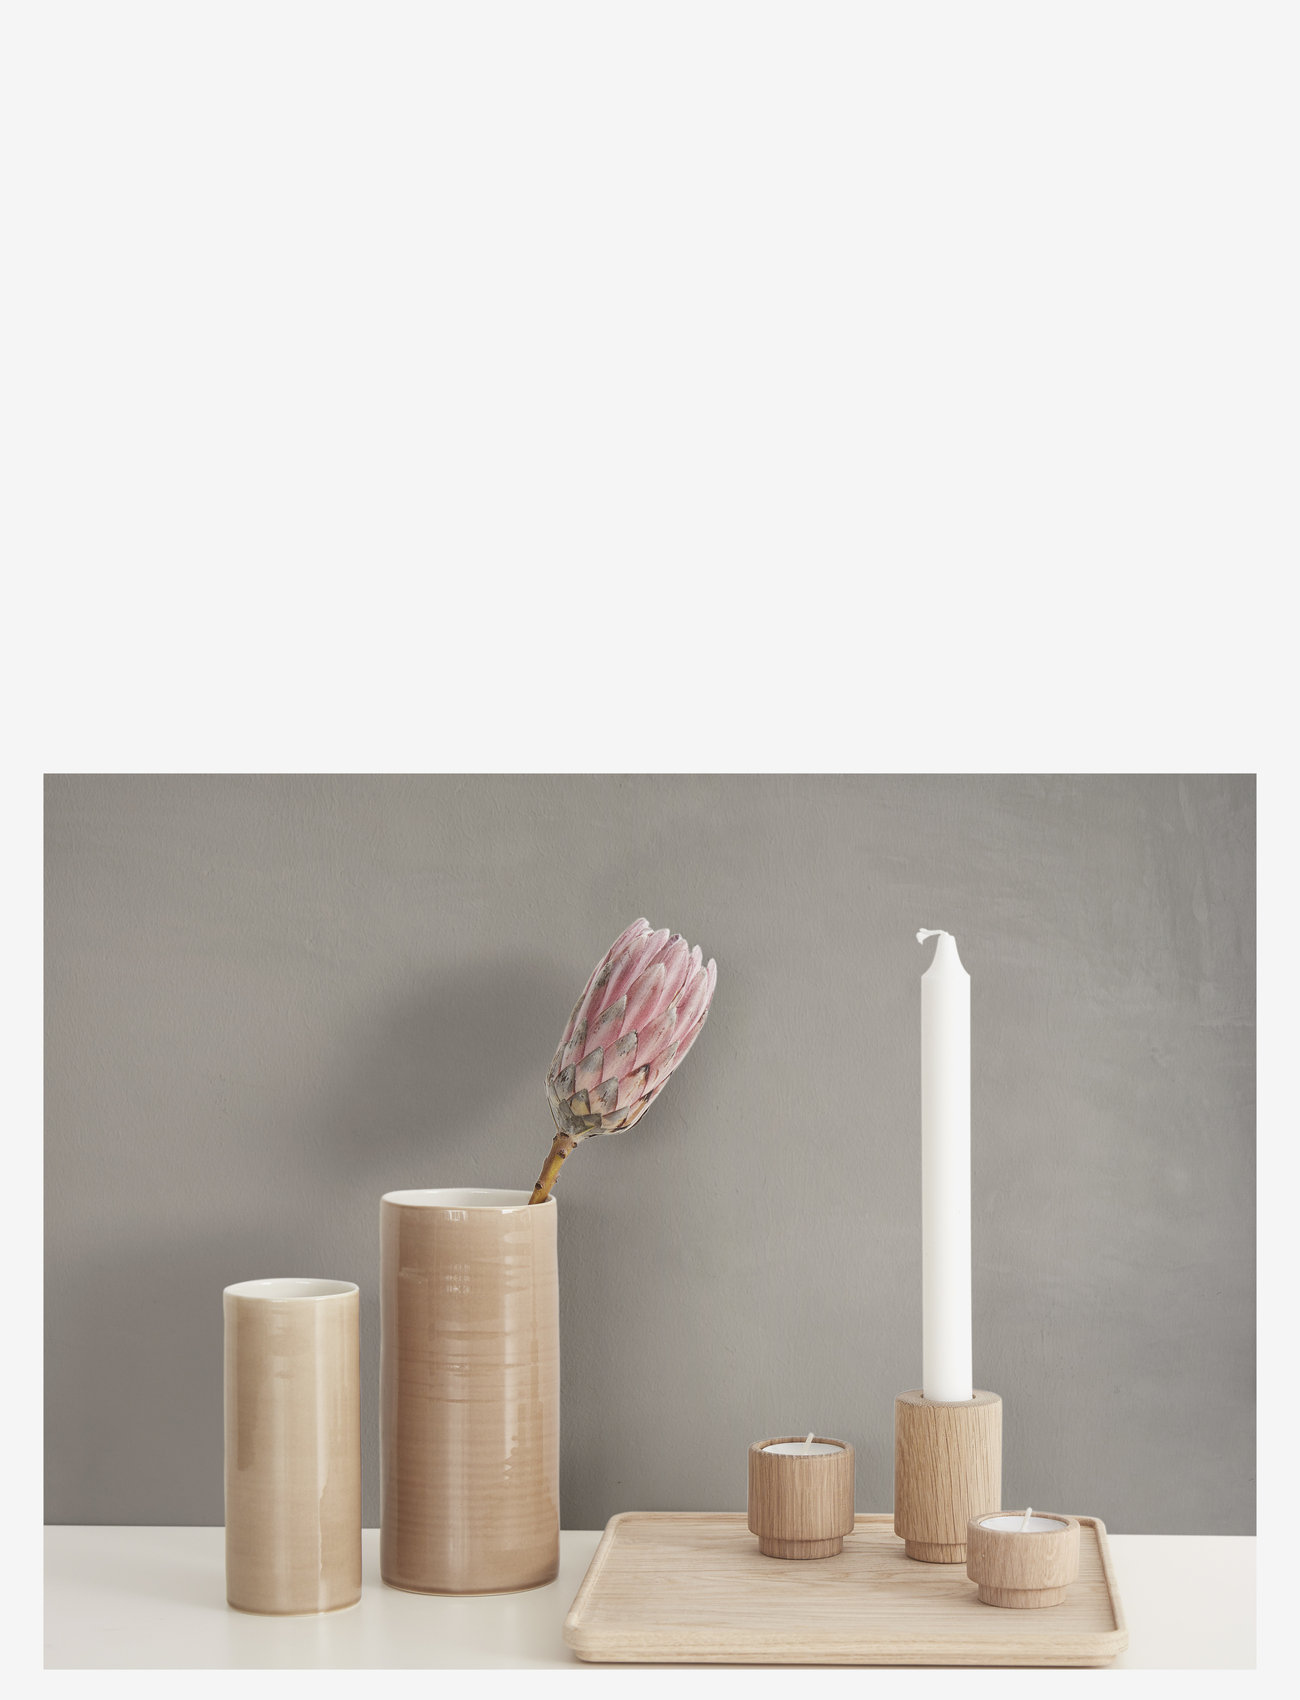 Andersen Furniture - Create me candleholder - lyslykter - no color - 1